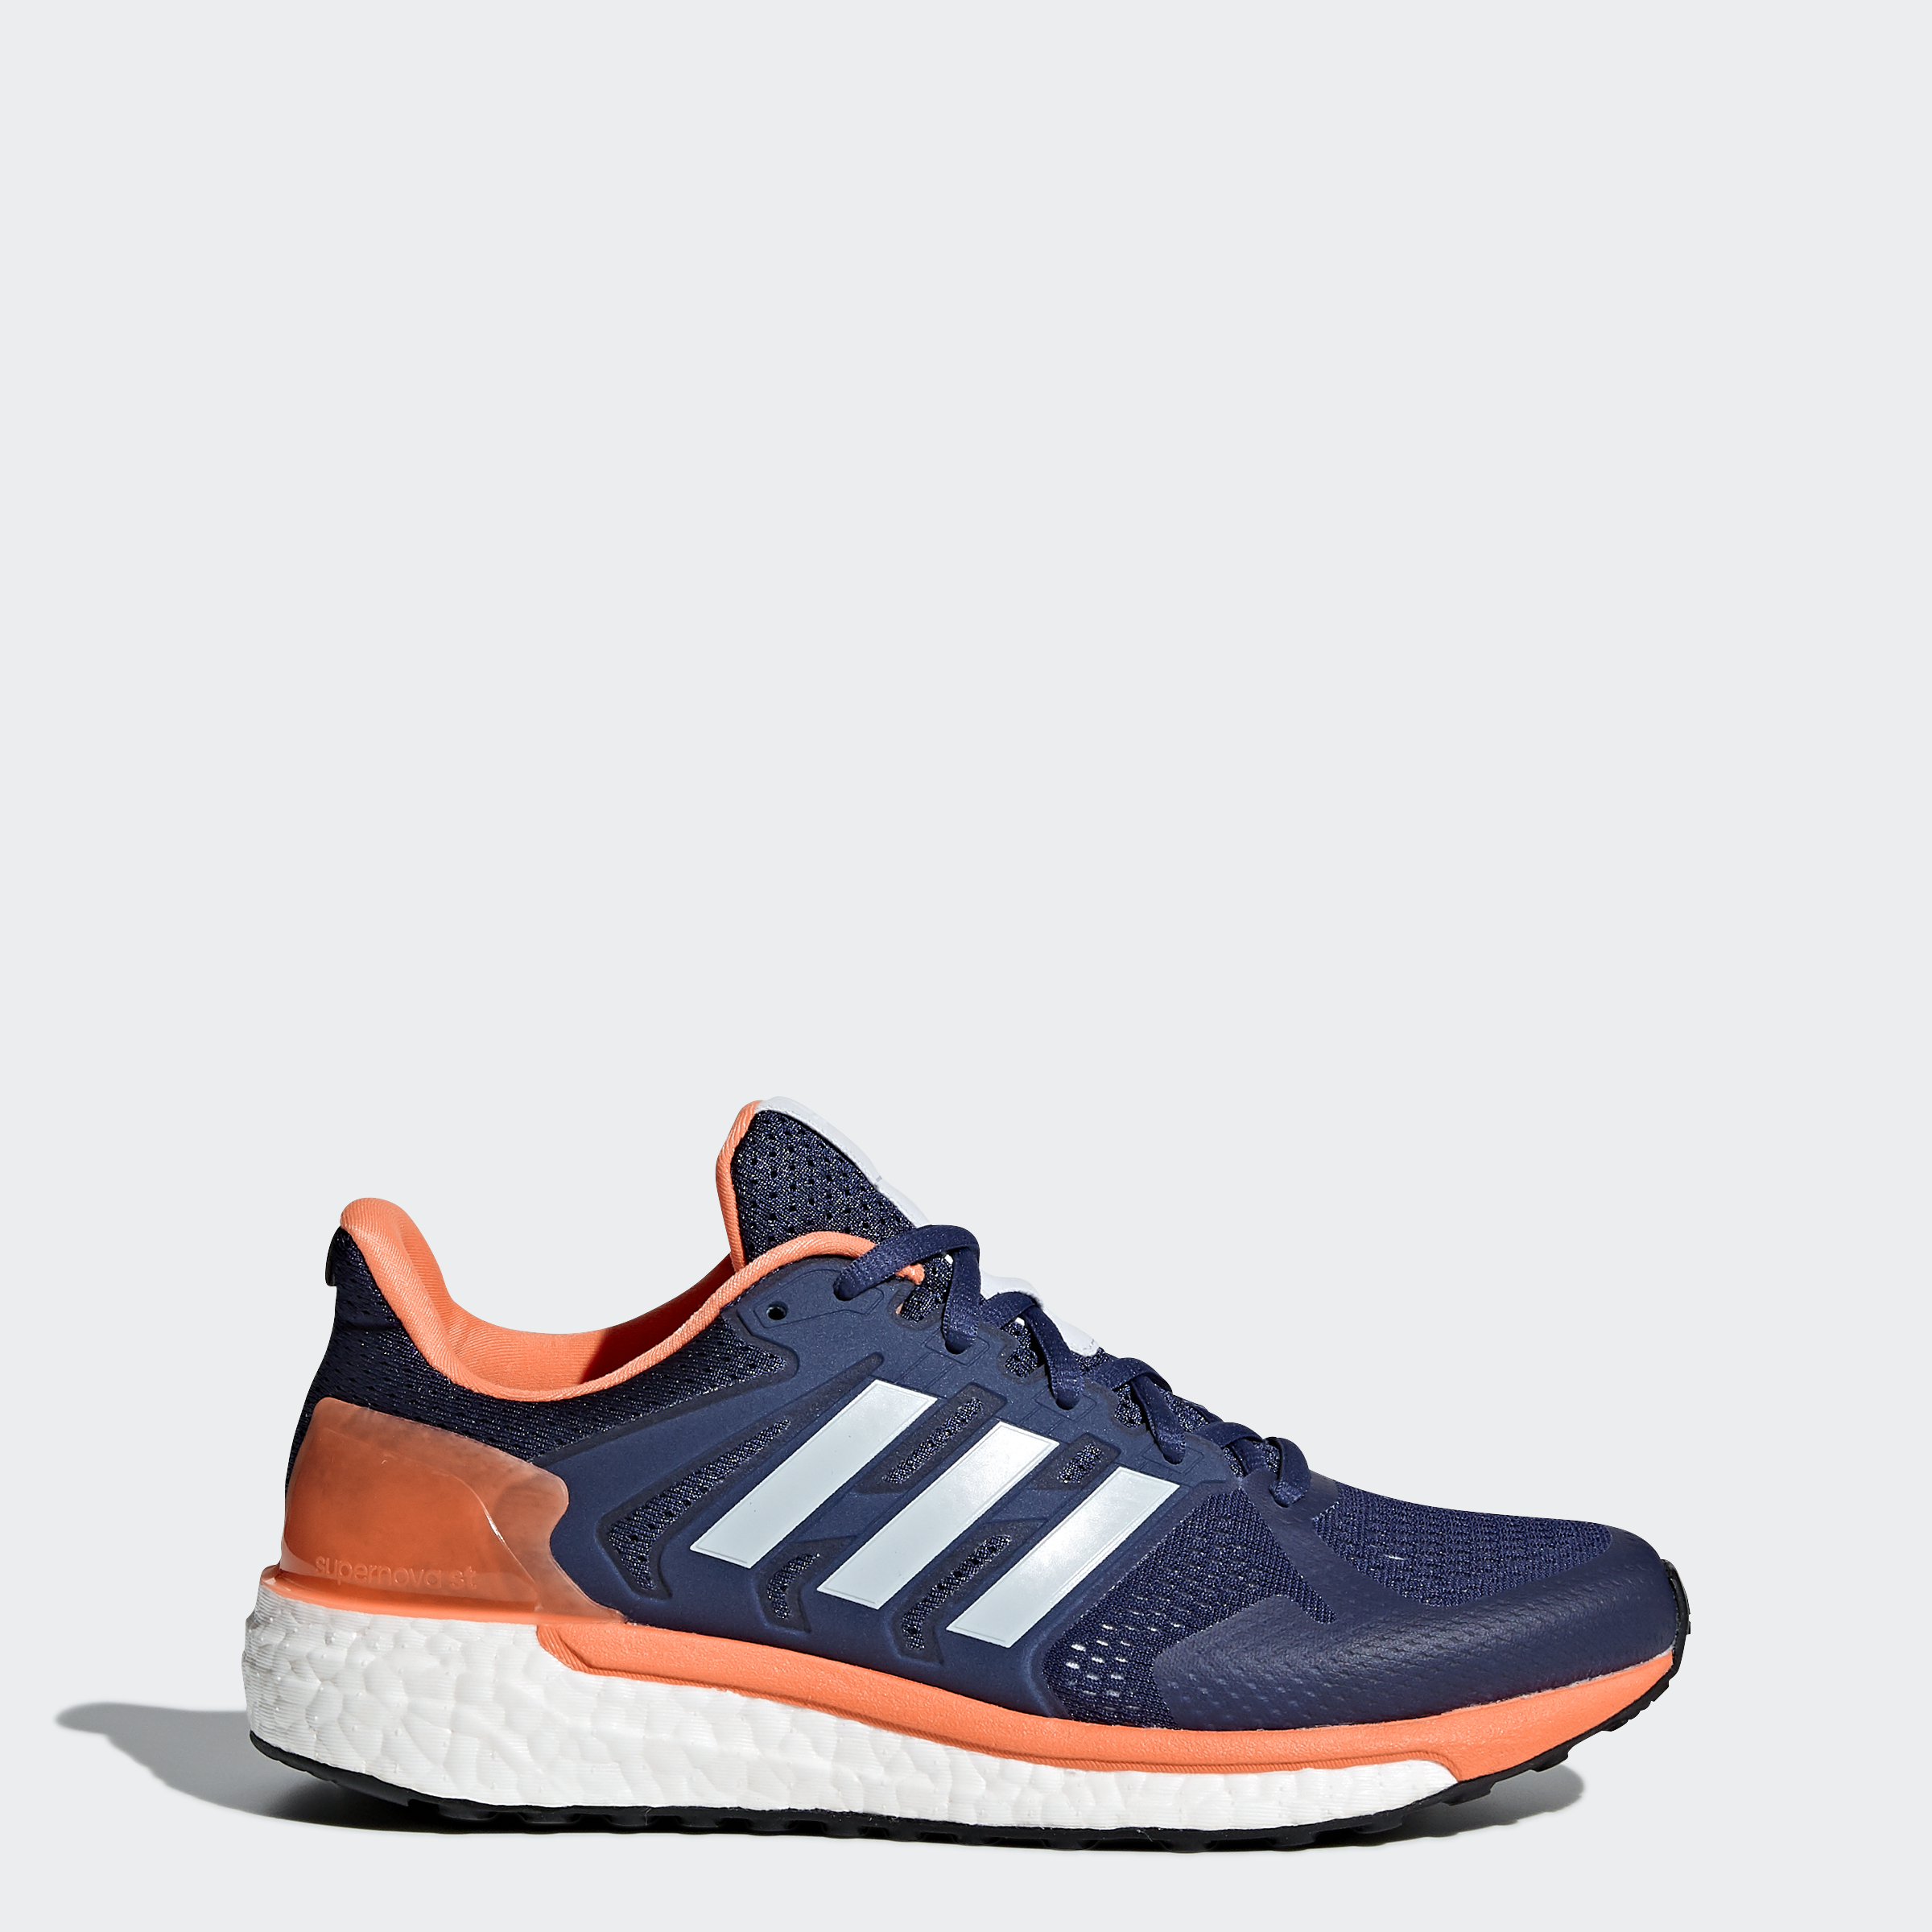 adidas-Supernova-ST-Shoes-Women-039-s thumbnail 9